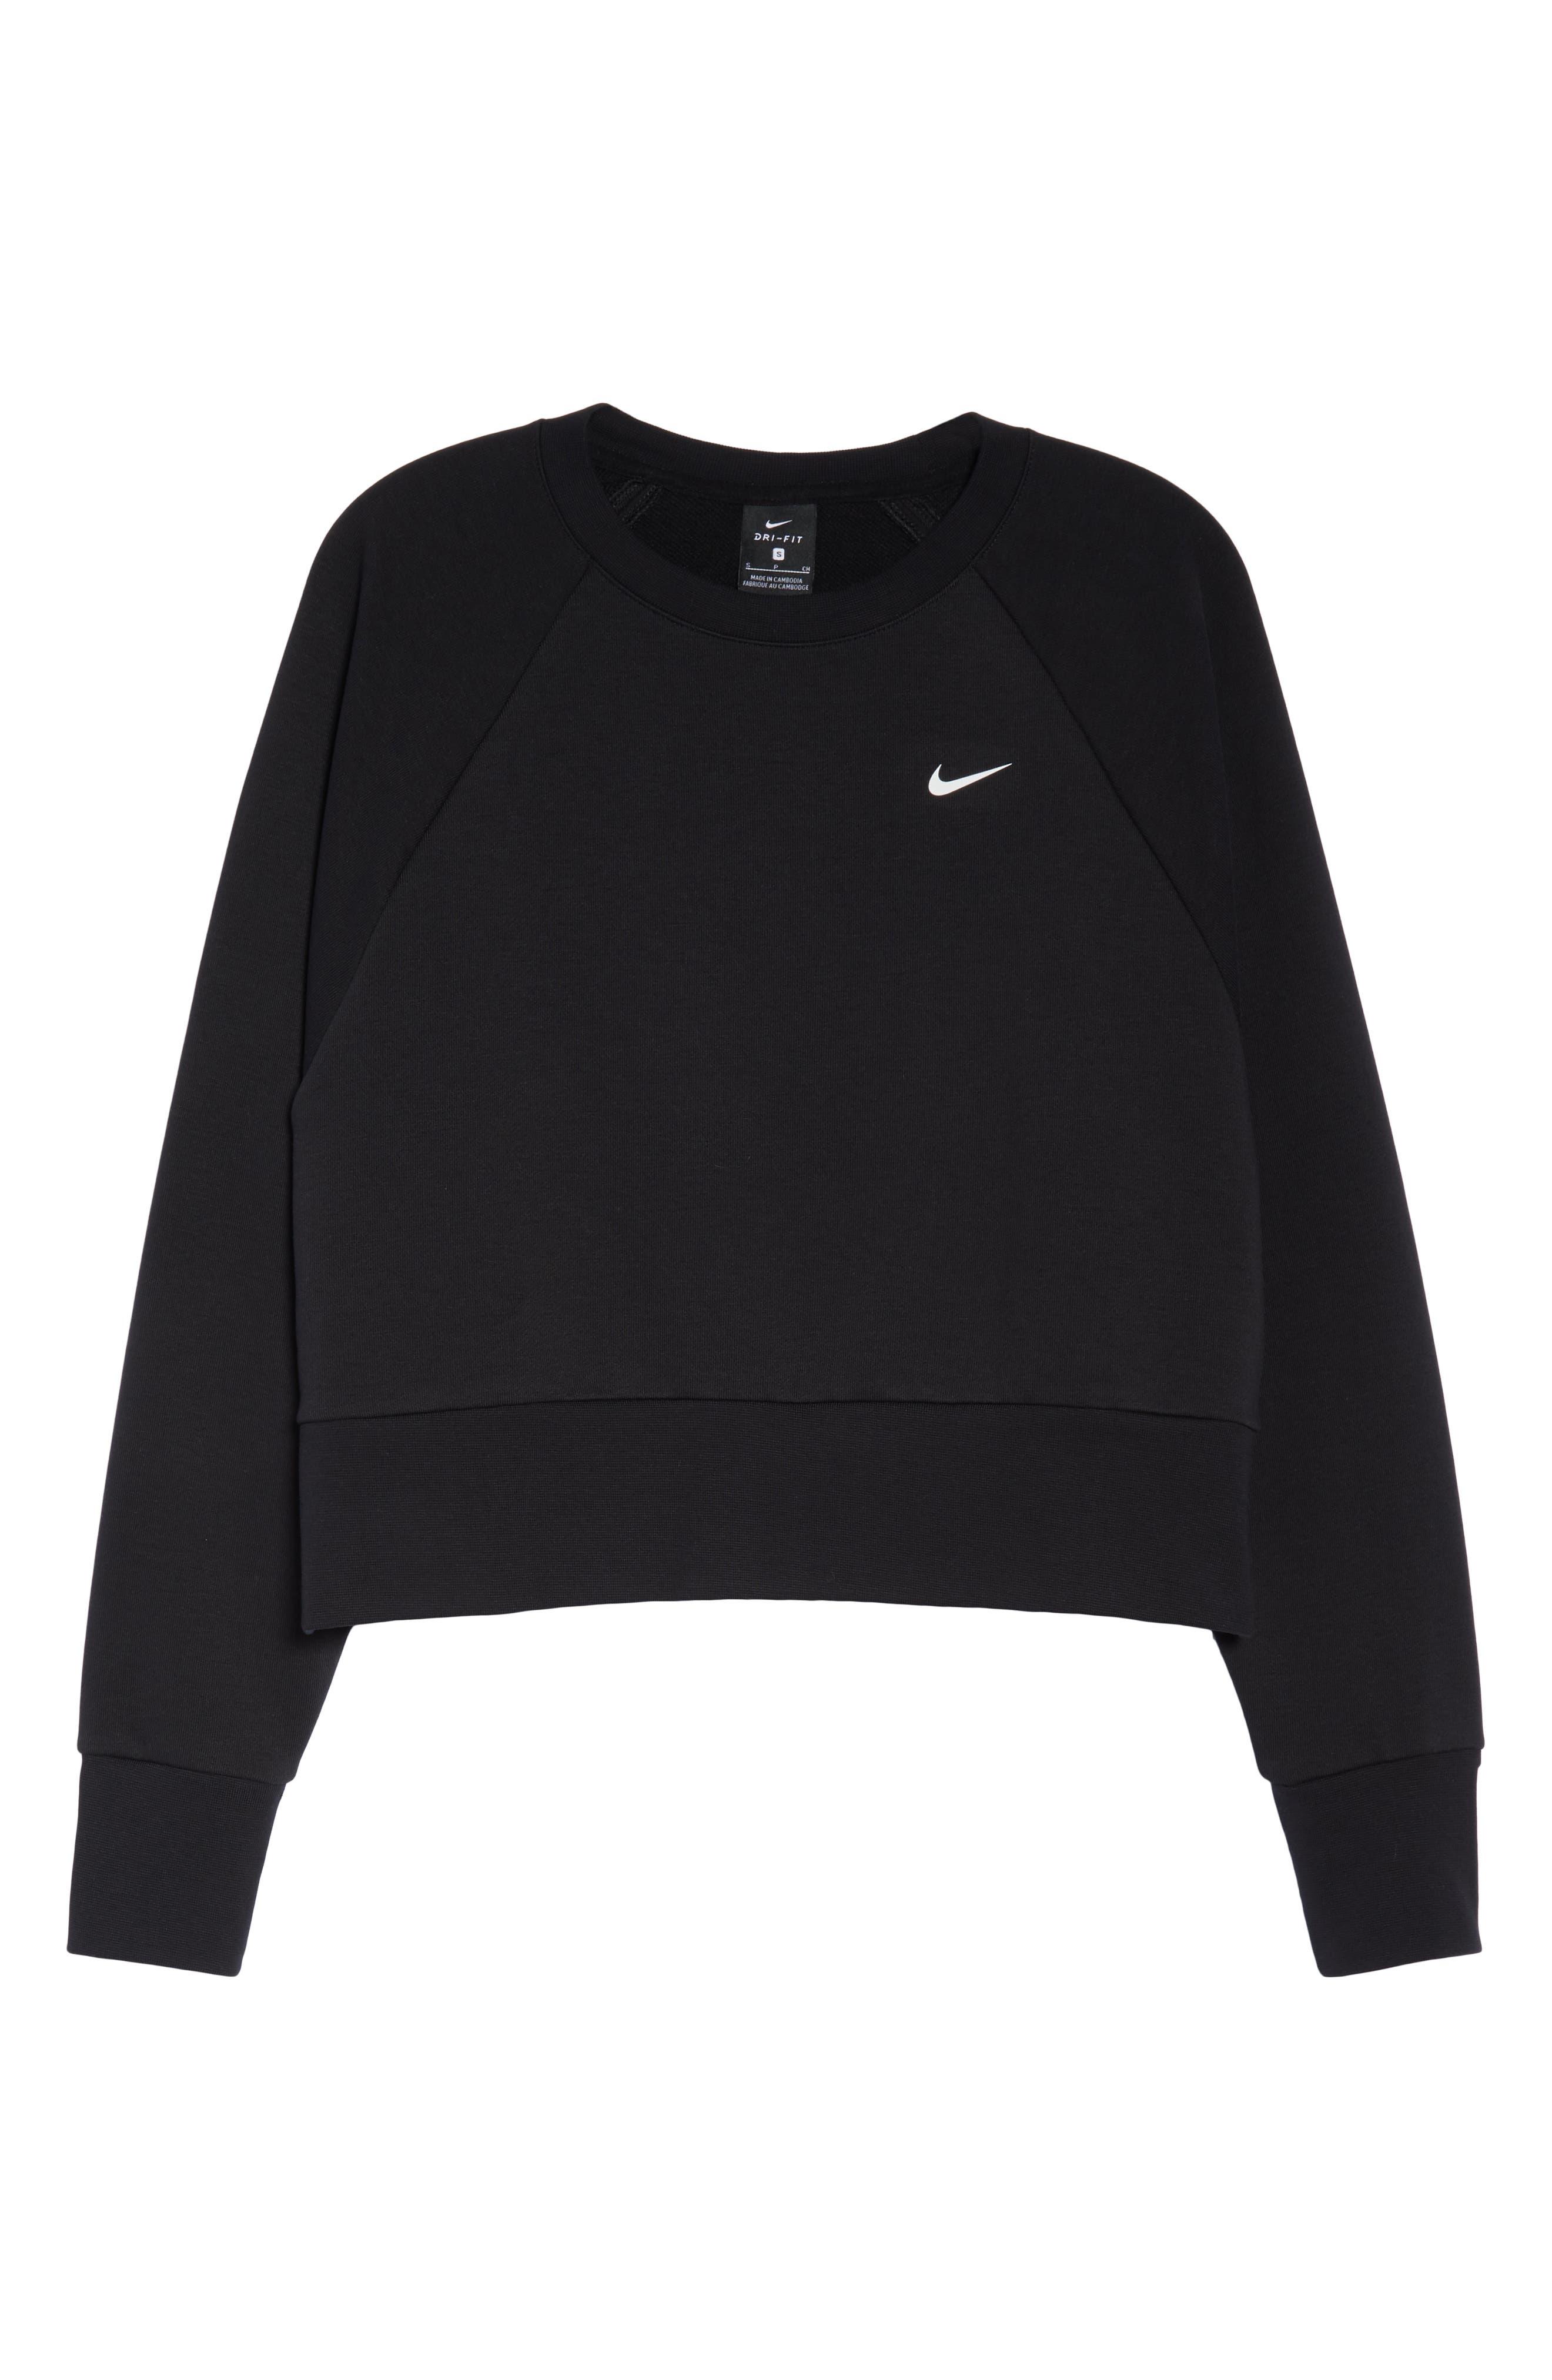 NIKE, Dry Cropped Training Sweatshirt, Alternate thumbnail 7, color, BLACK/ WHITE